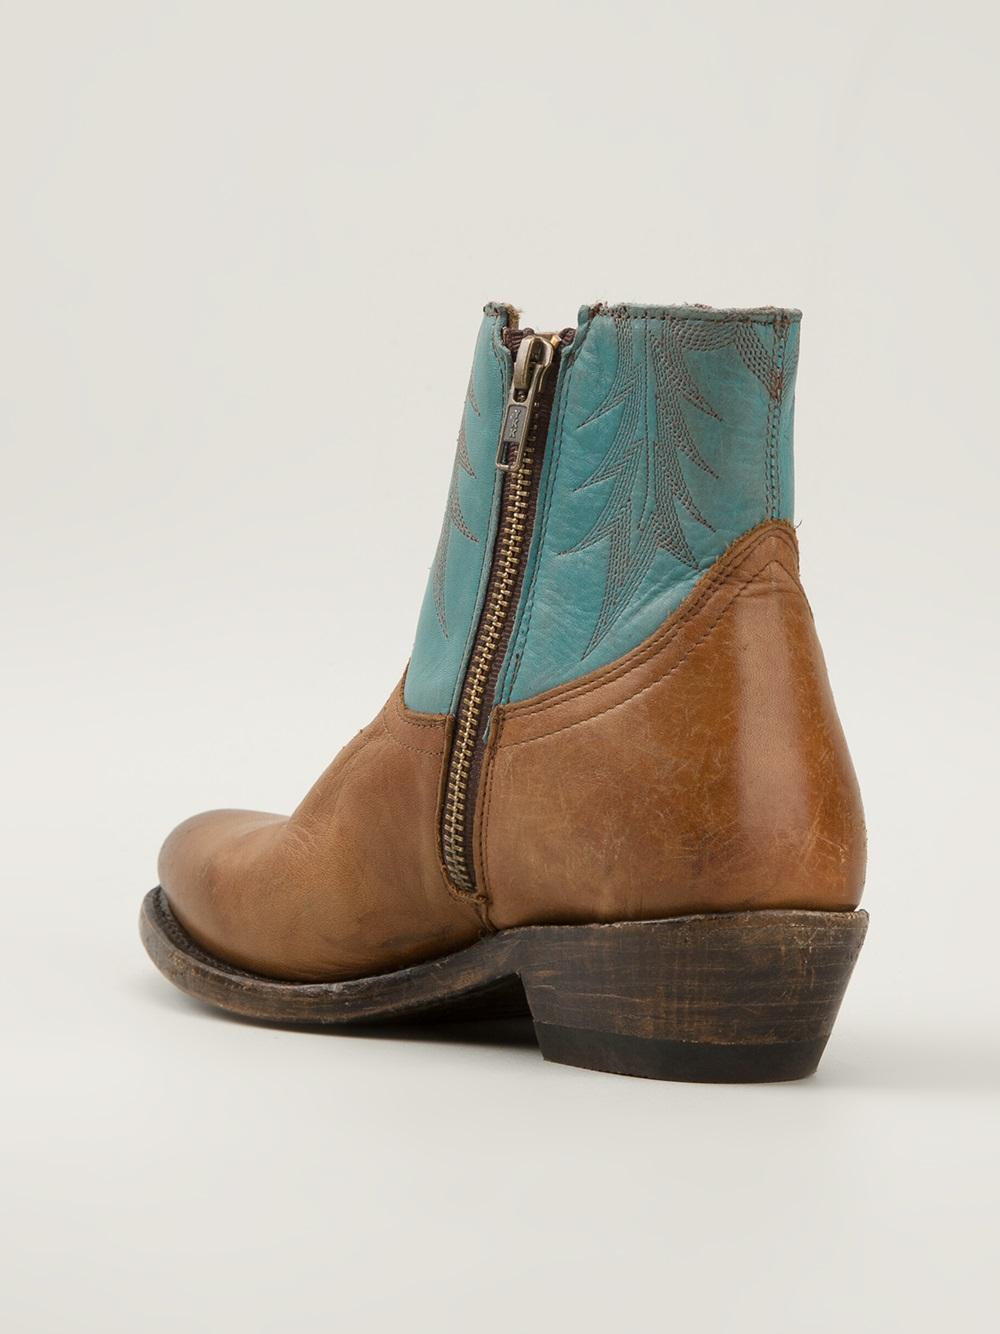 Ash Leather Western Boots 32CW5w6xBx